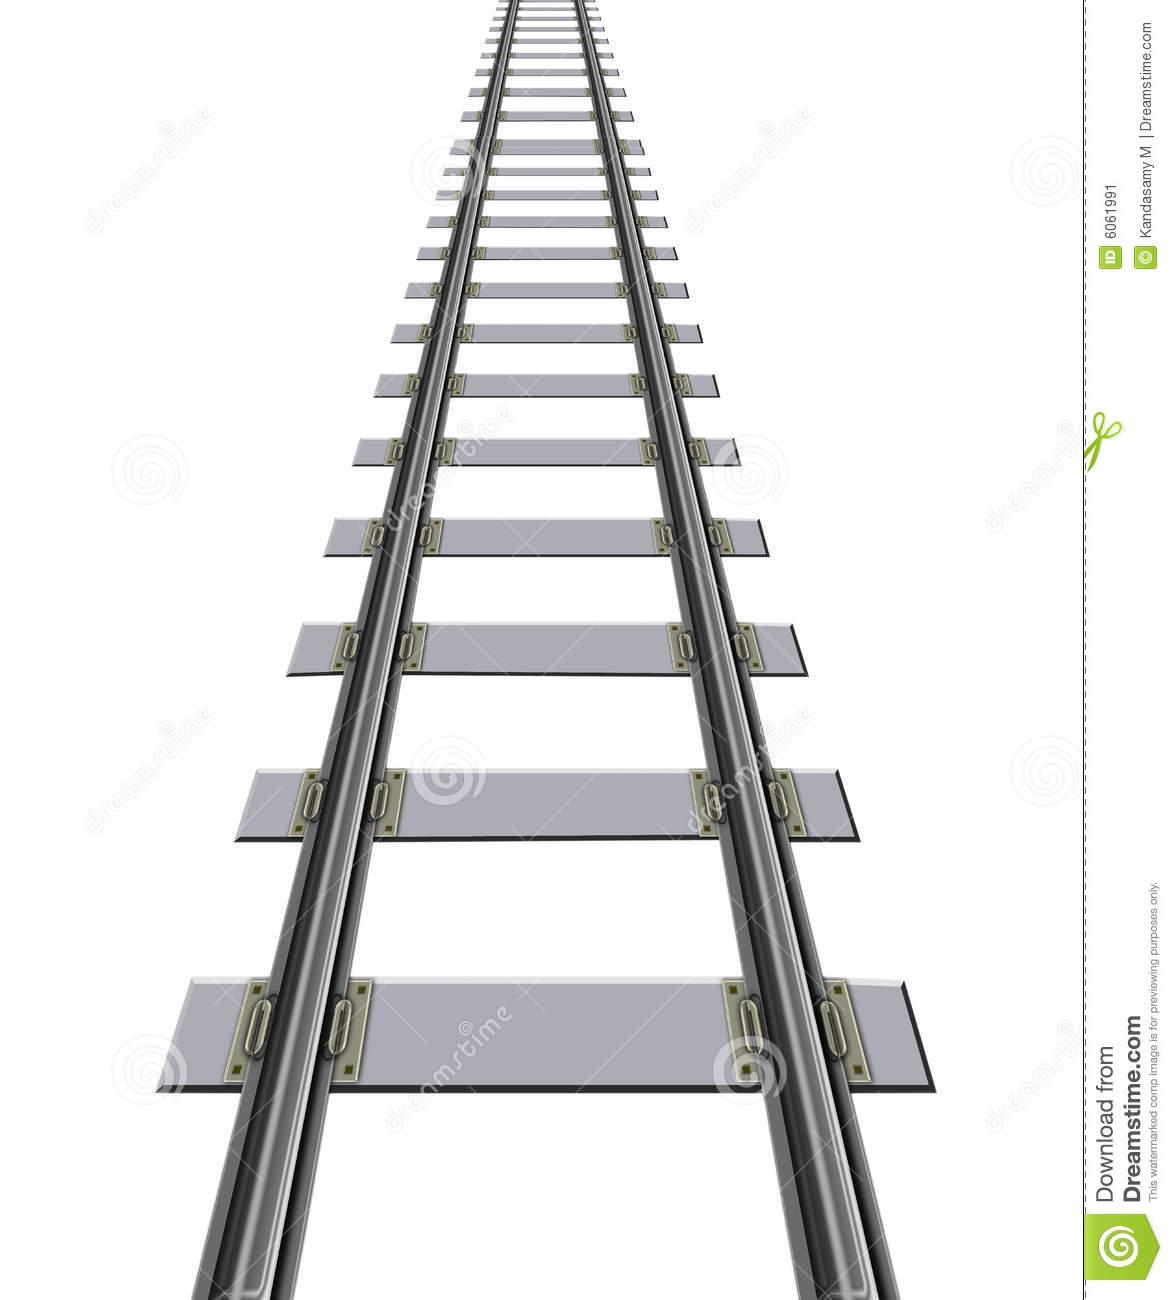 Railway Rails Clipart